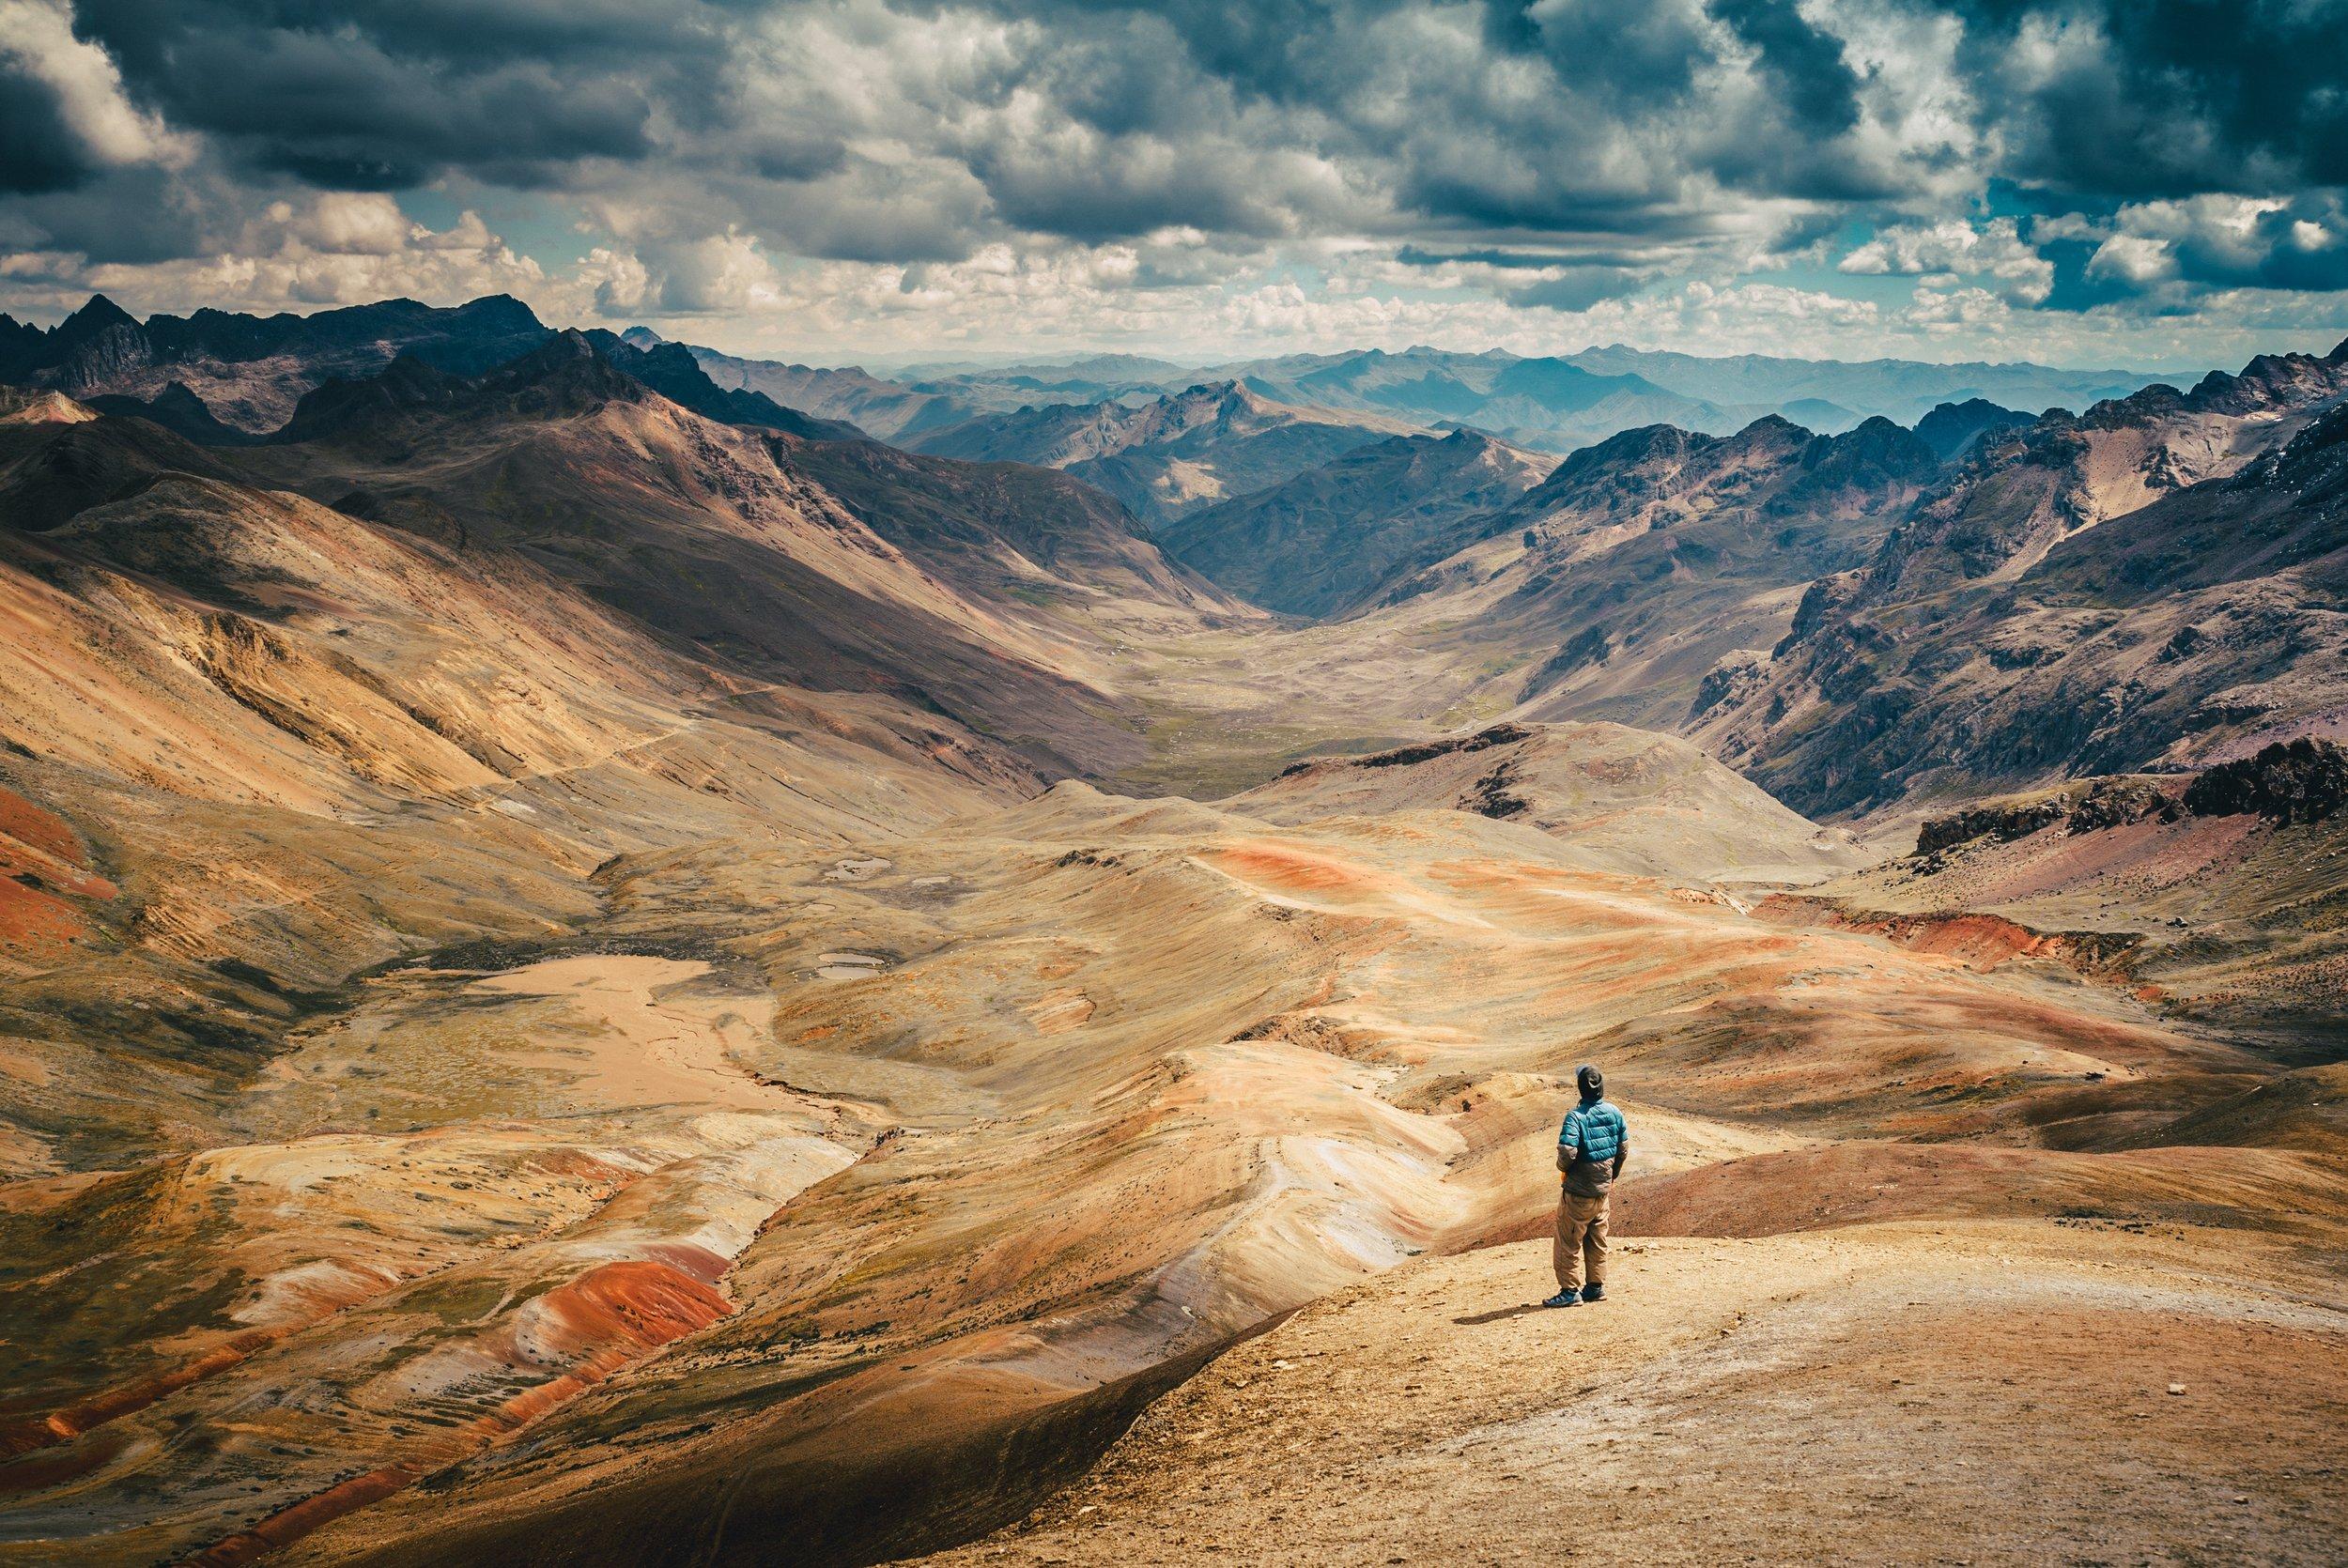 Copy of Cusco - Peru EdOdyssey (Sierra, Andes)